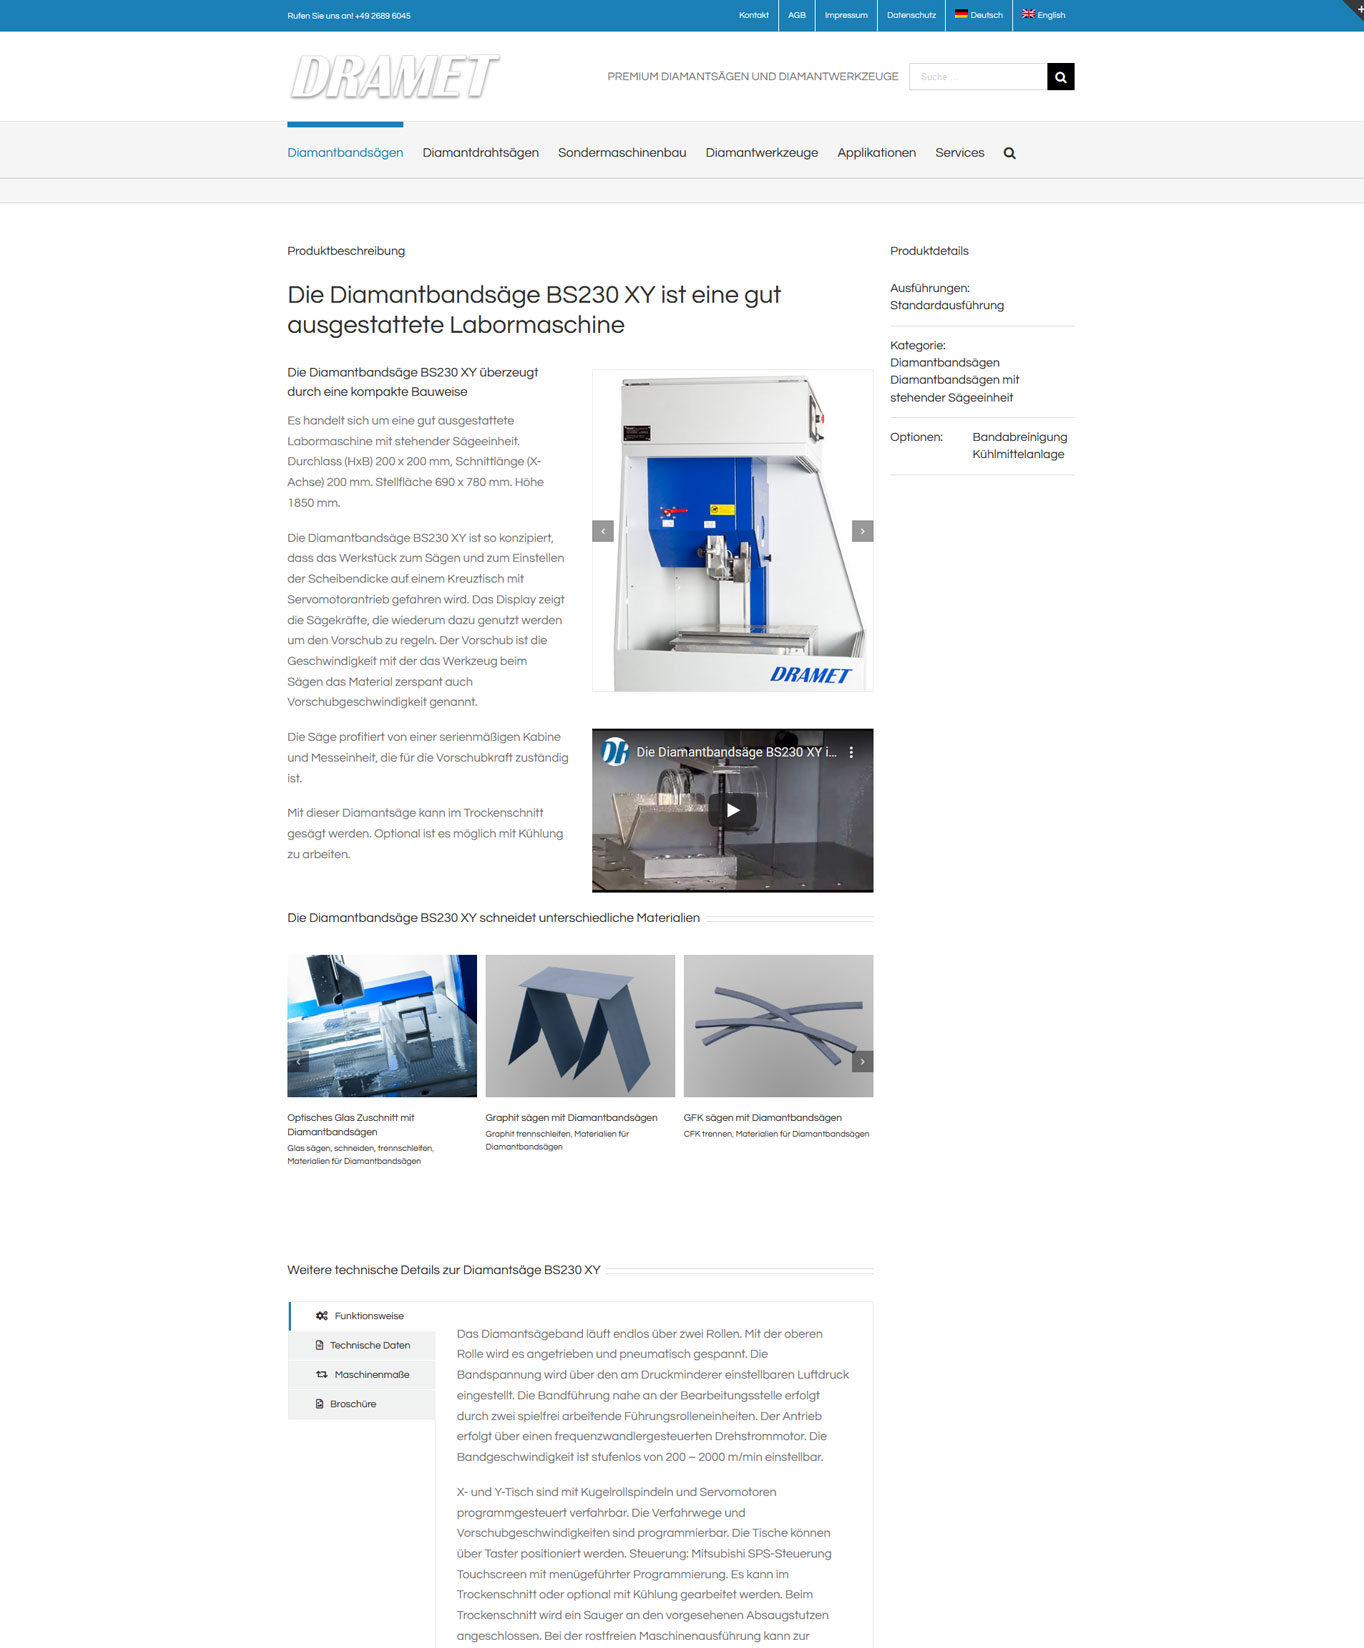 DRAMET Diamantbandsaegen DRAMET - SEO und Contentmarketing JF Mediendesign